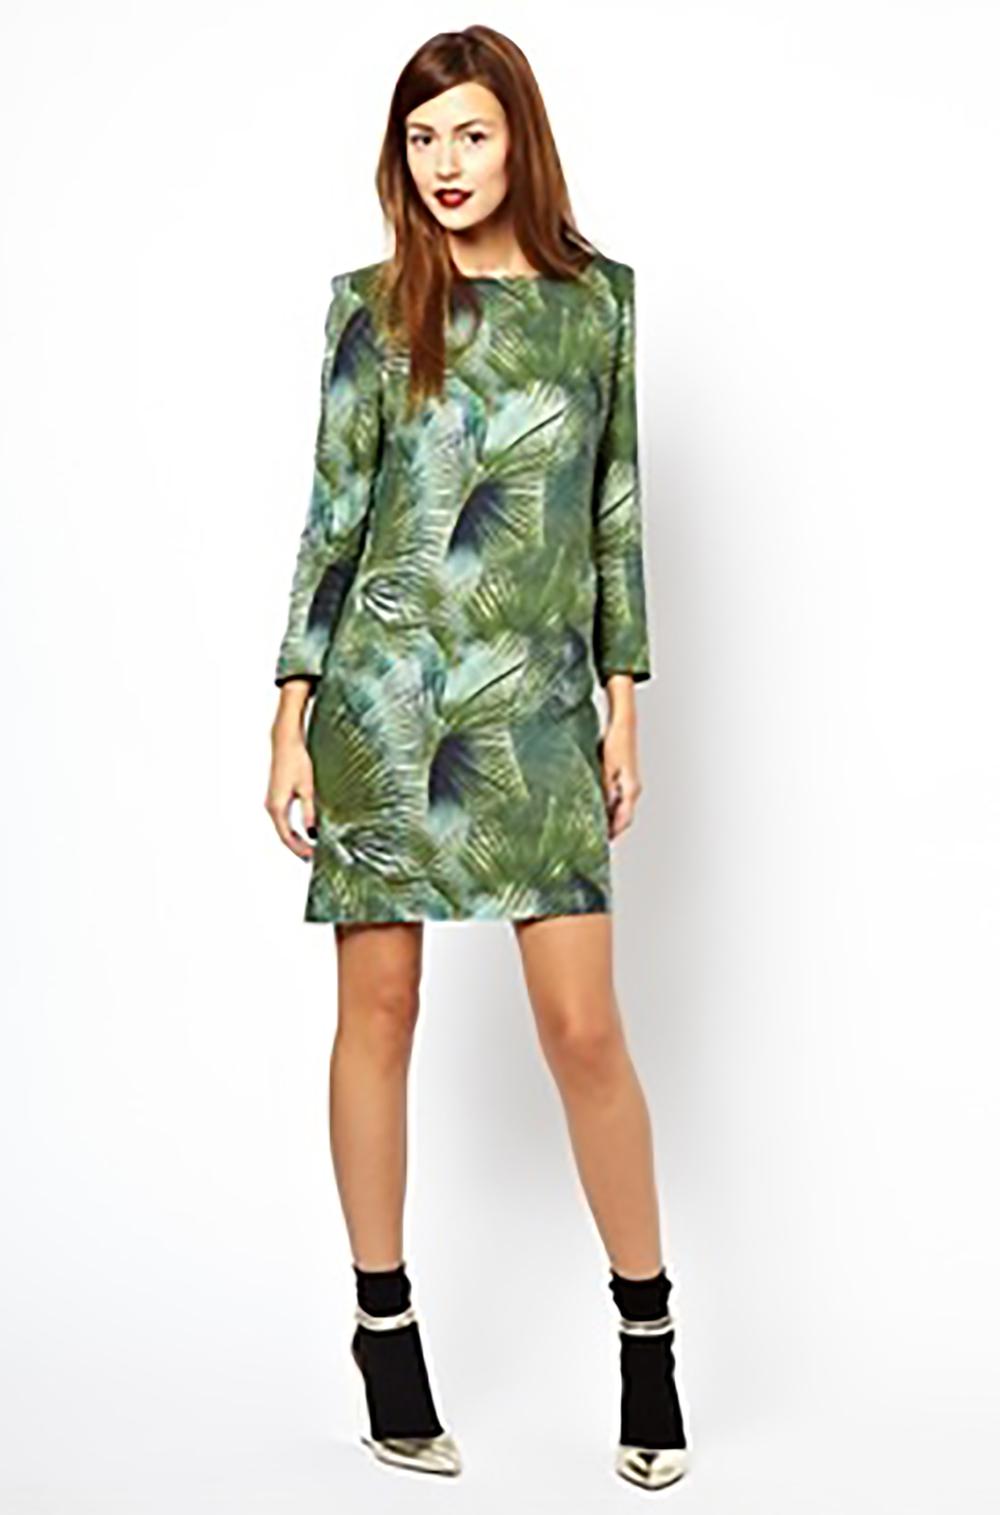 asos les prairies de paris 60s shift dress with padded shoulders in jungle short dresses 1500.jpg